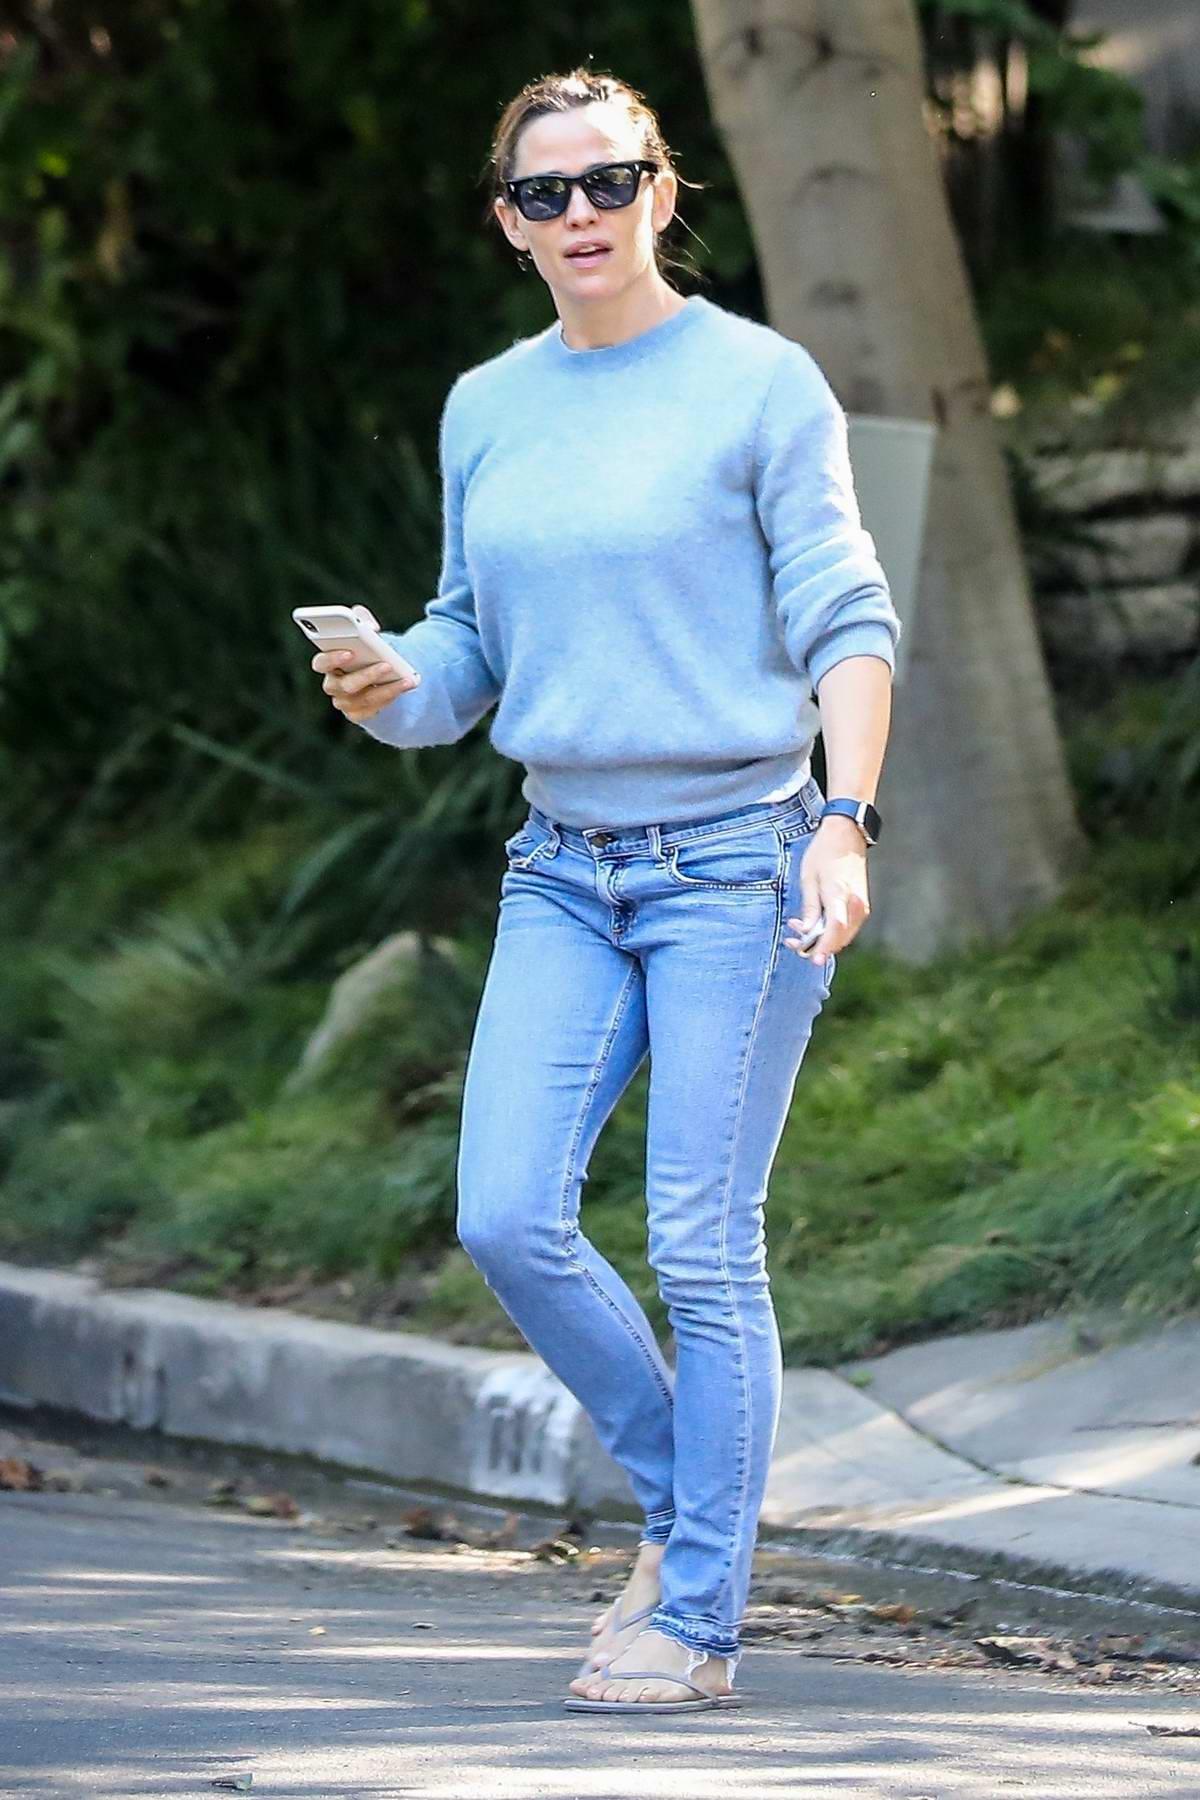 Jennifer Garner stops by Bradley Cooper's house in Los Angeles